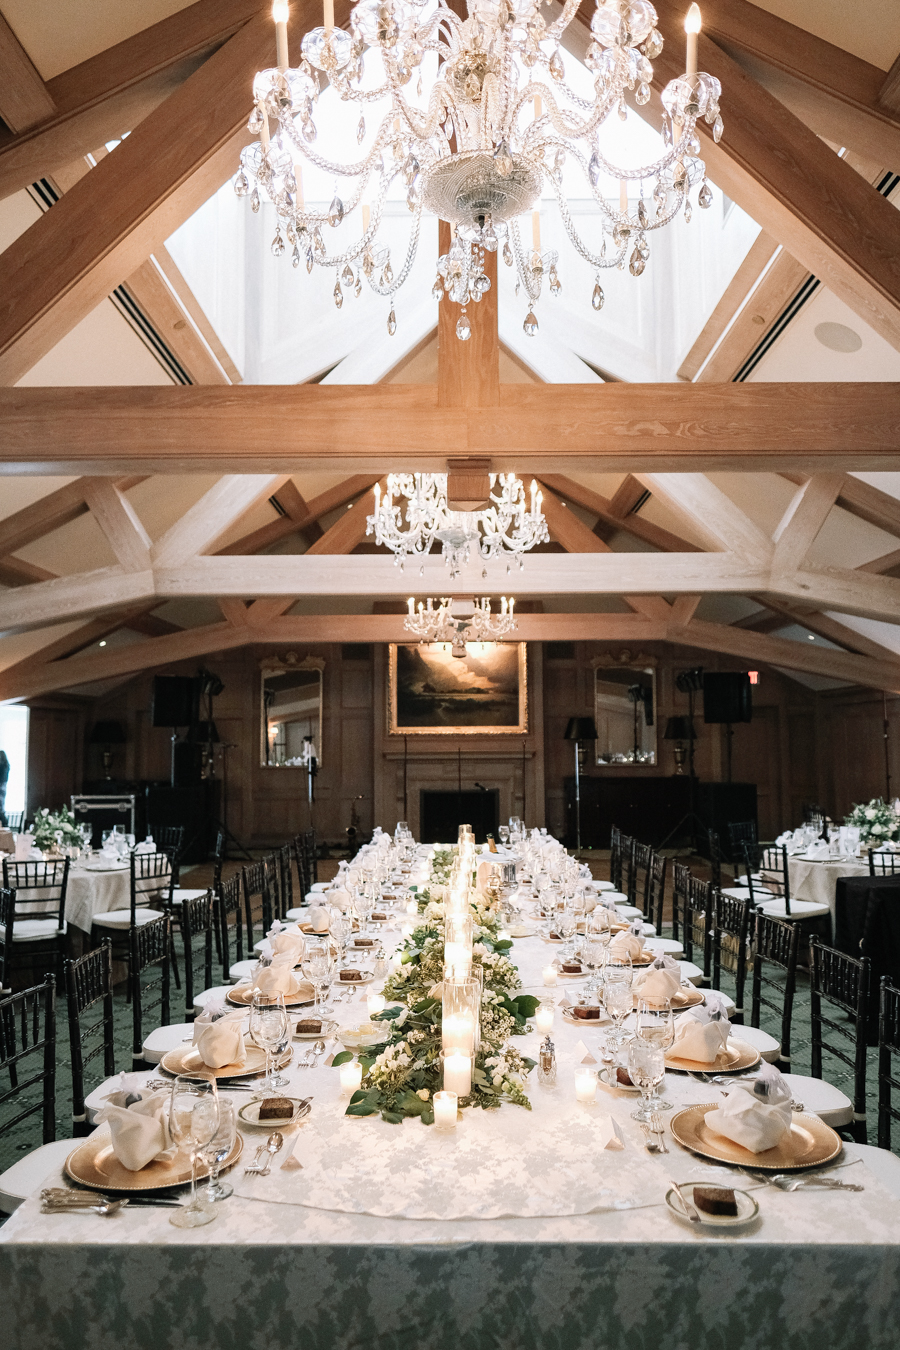 Bloomfield_Hills_Country_Club_Wedding-54.jpg